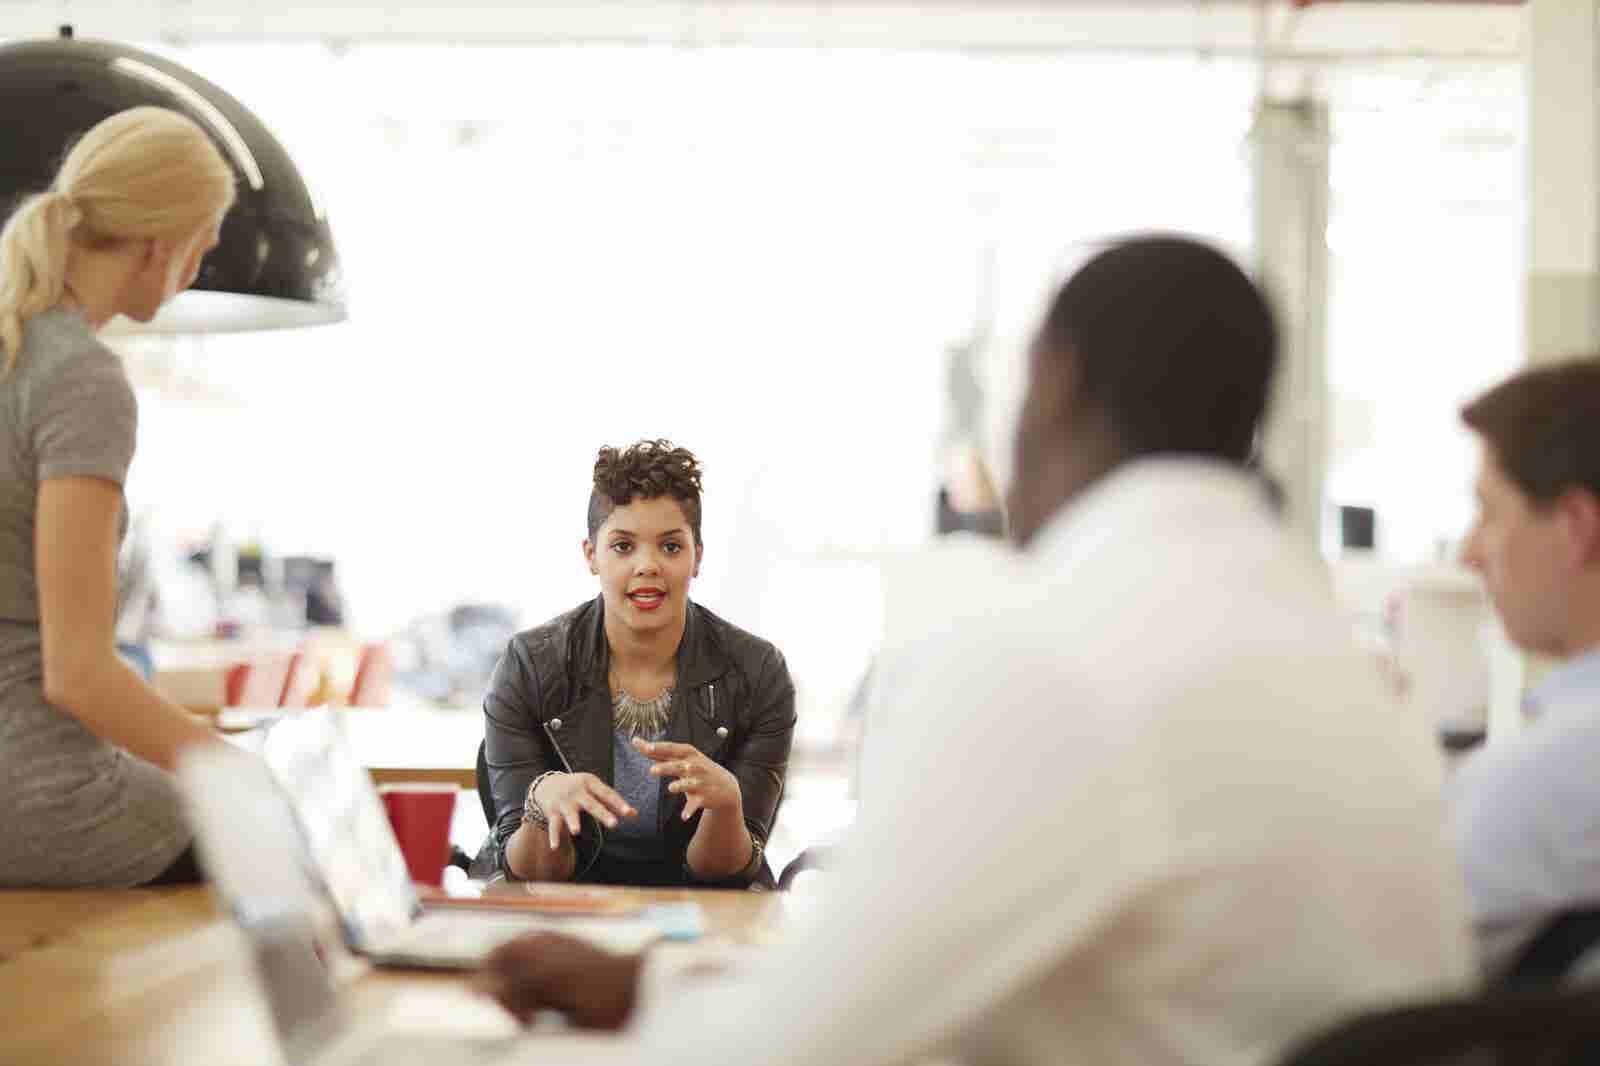 5 Ways to Become More Persuasive